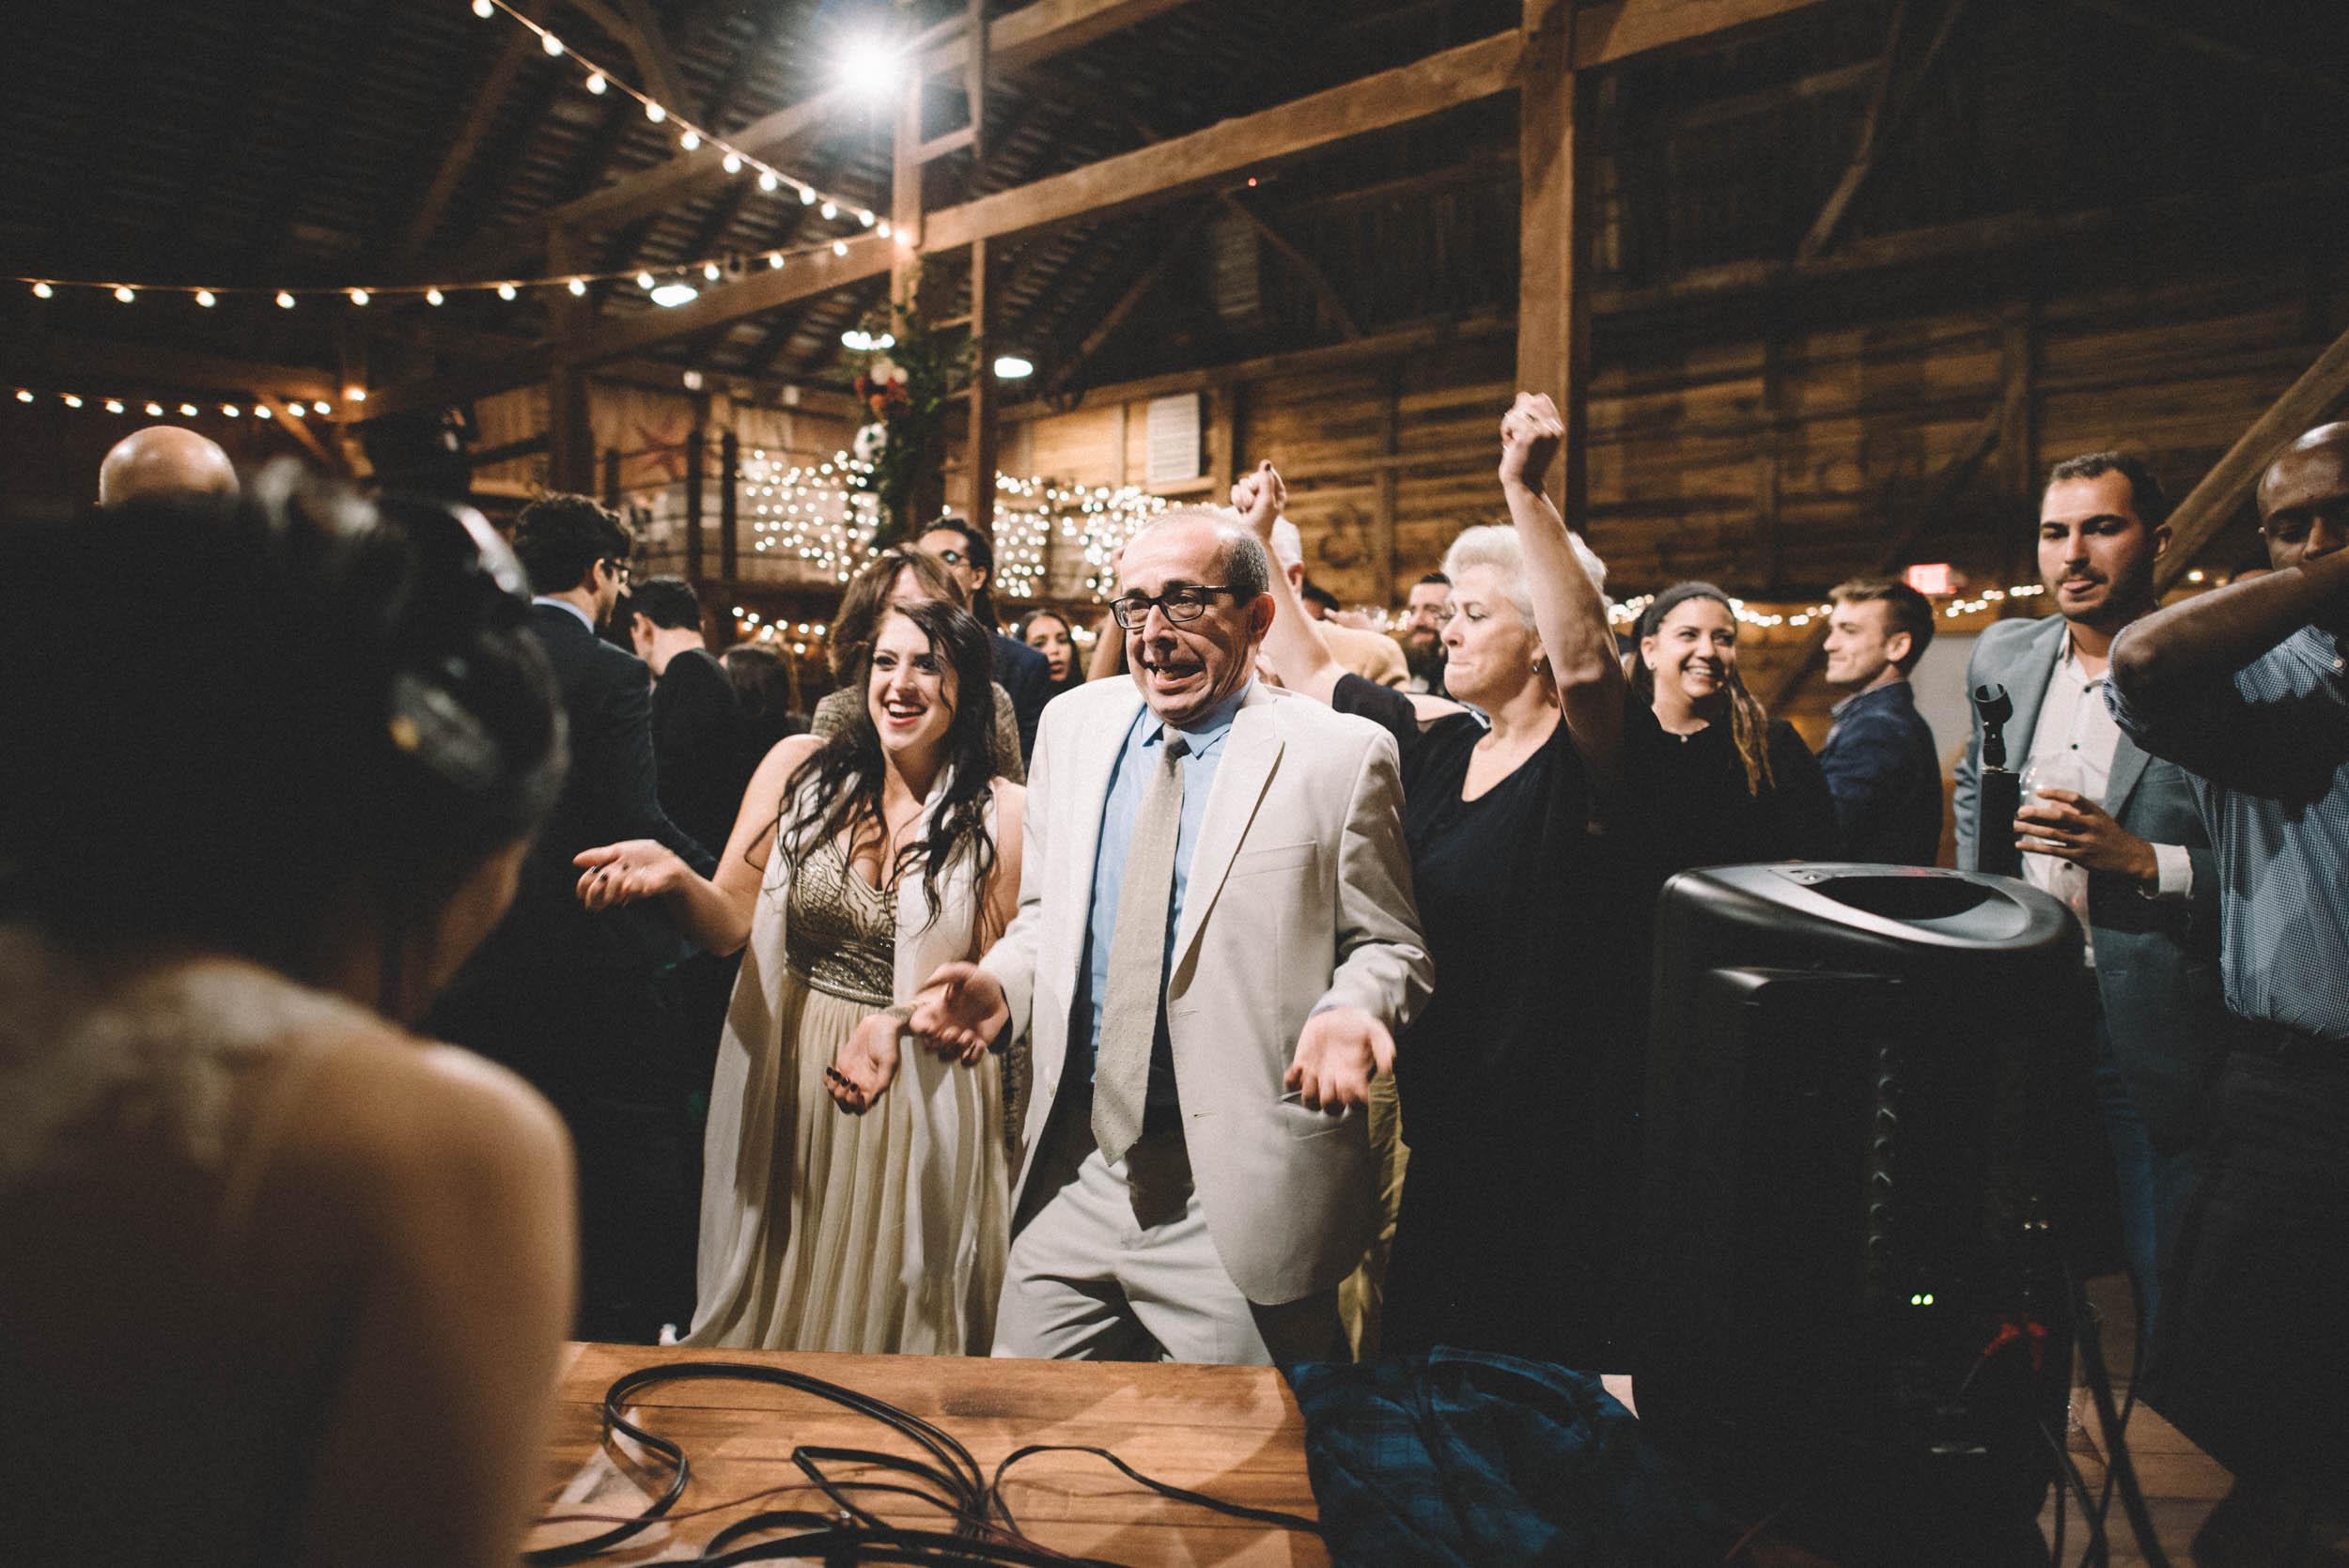 poolseville-maryland-wedding-photographer-70.jpg